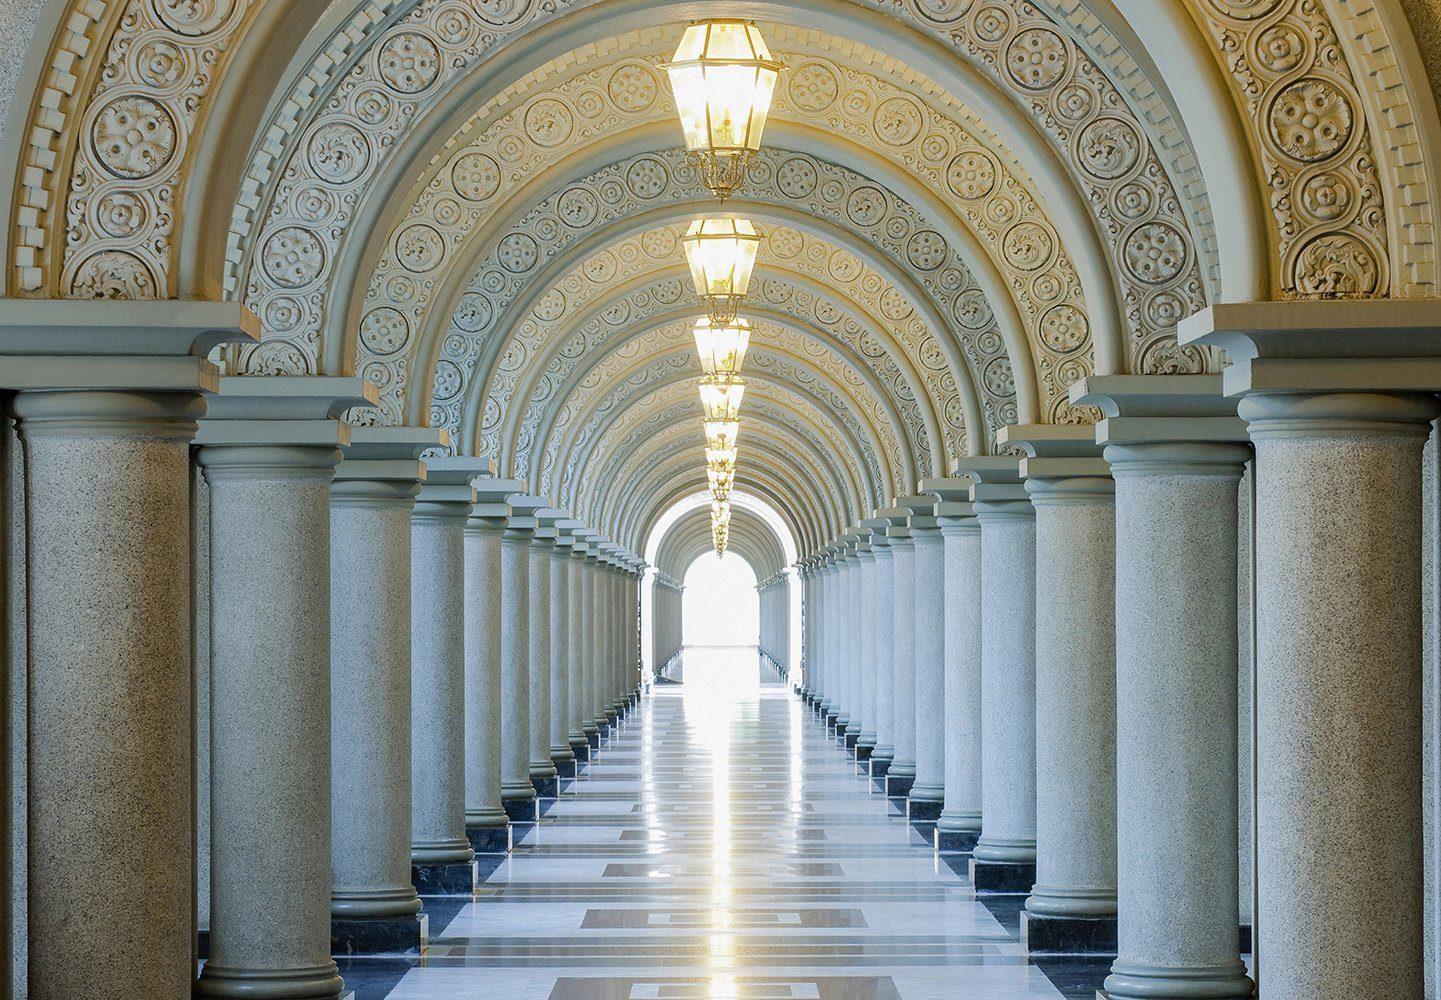 Fototapete »Archway«, 8-teilig, 366x254 cm